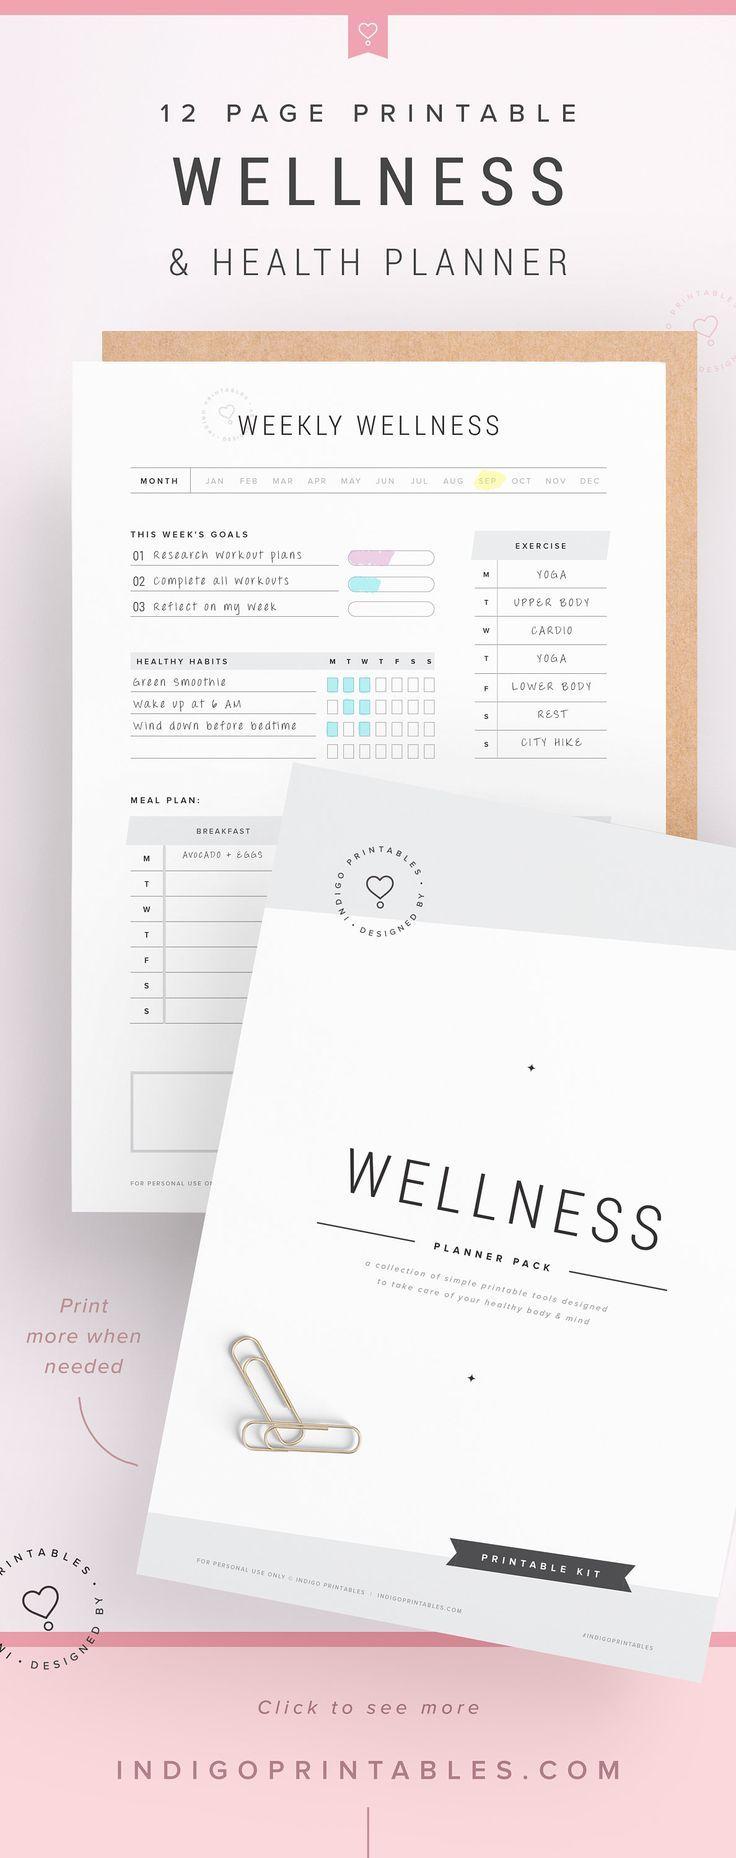 Wellness Planner, Self Care Planner, Wellbeing Planner